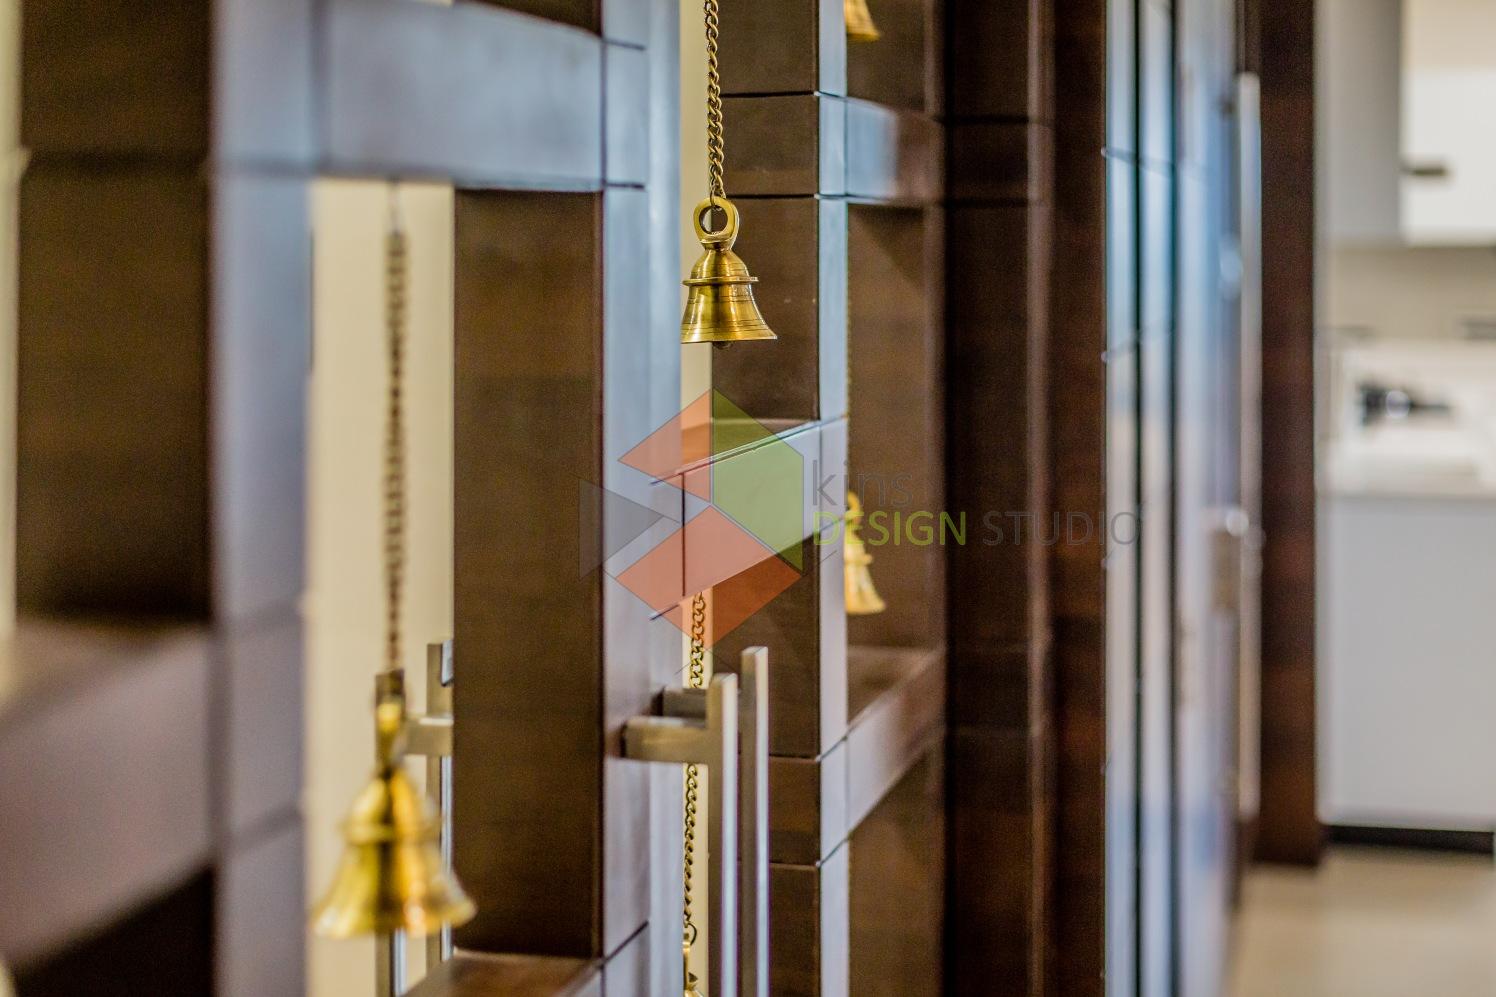 Jingle Bells by Kinnera Naresh Indoor-spaces Modern   Interior Design Photos & Ideas